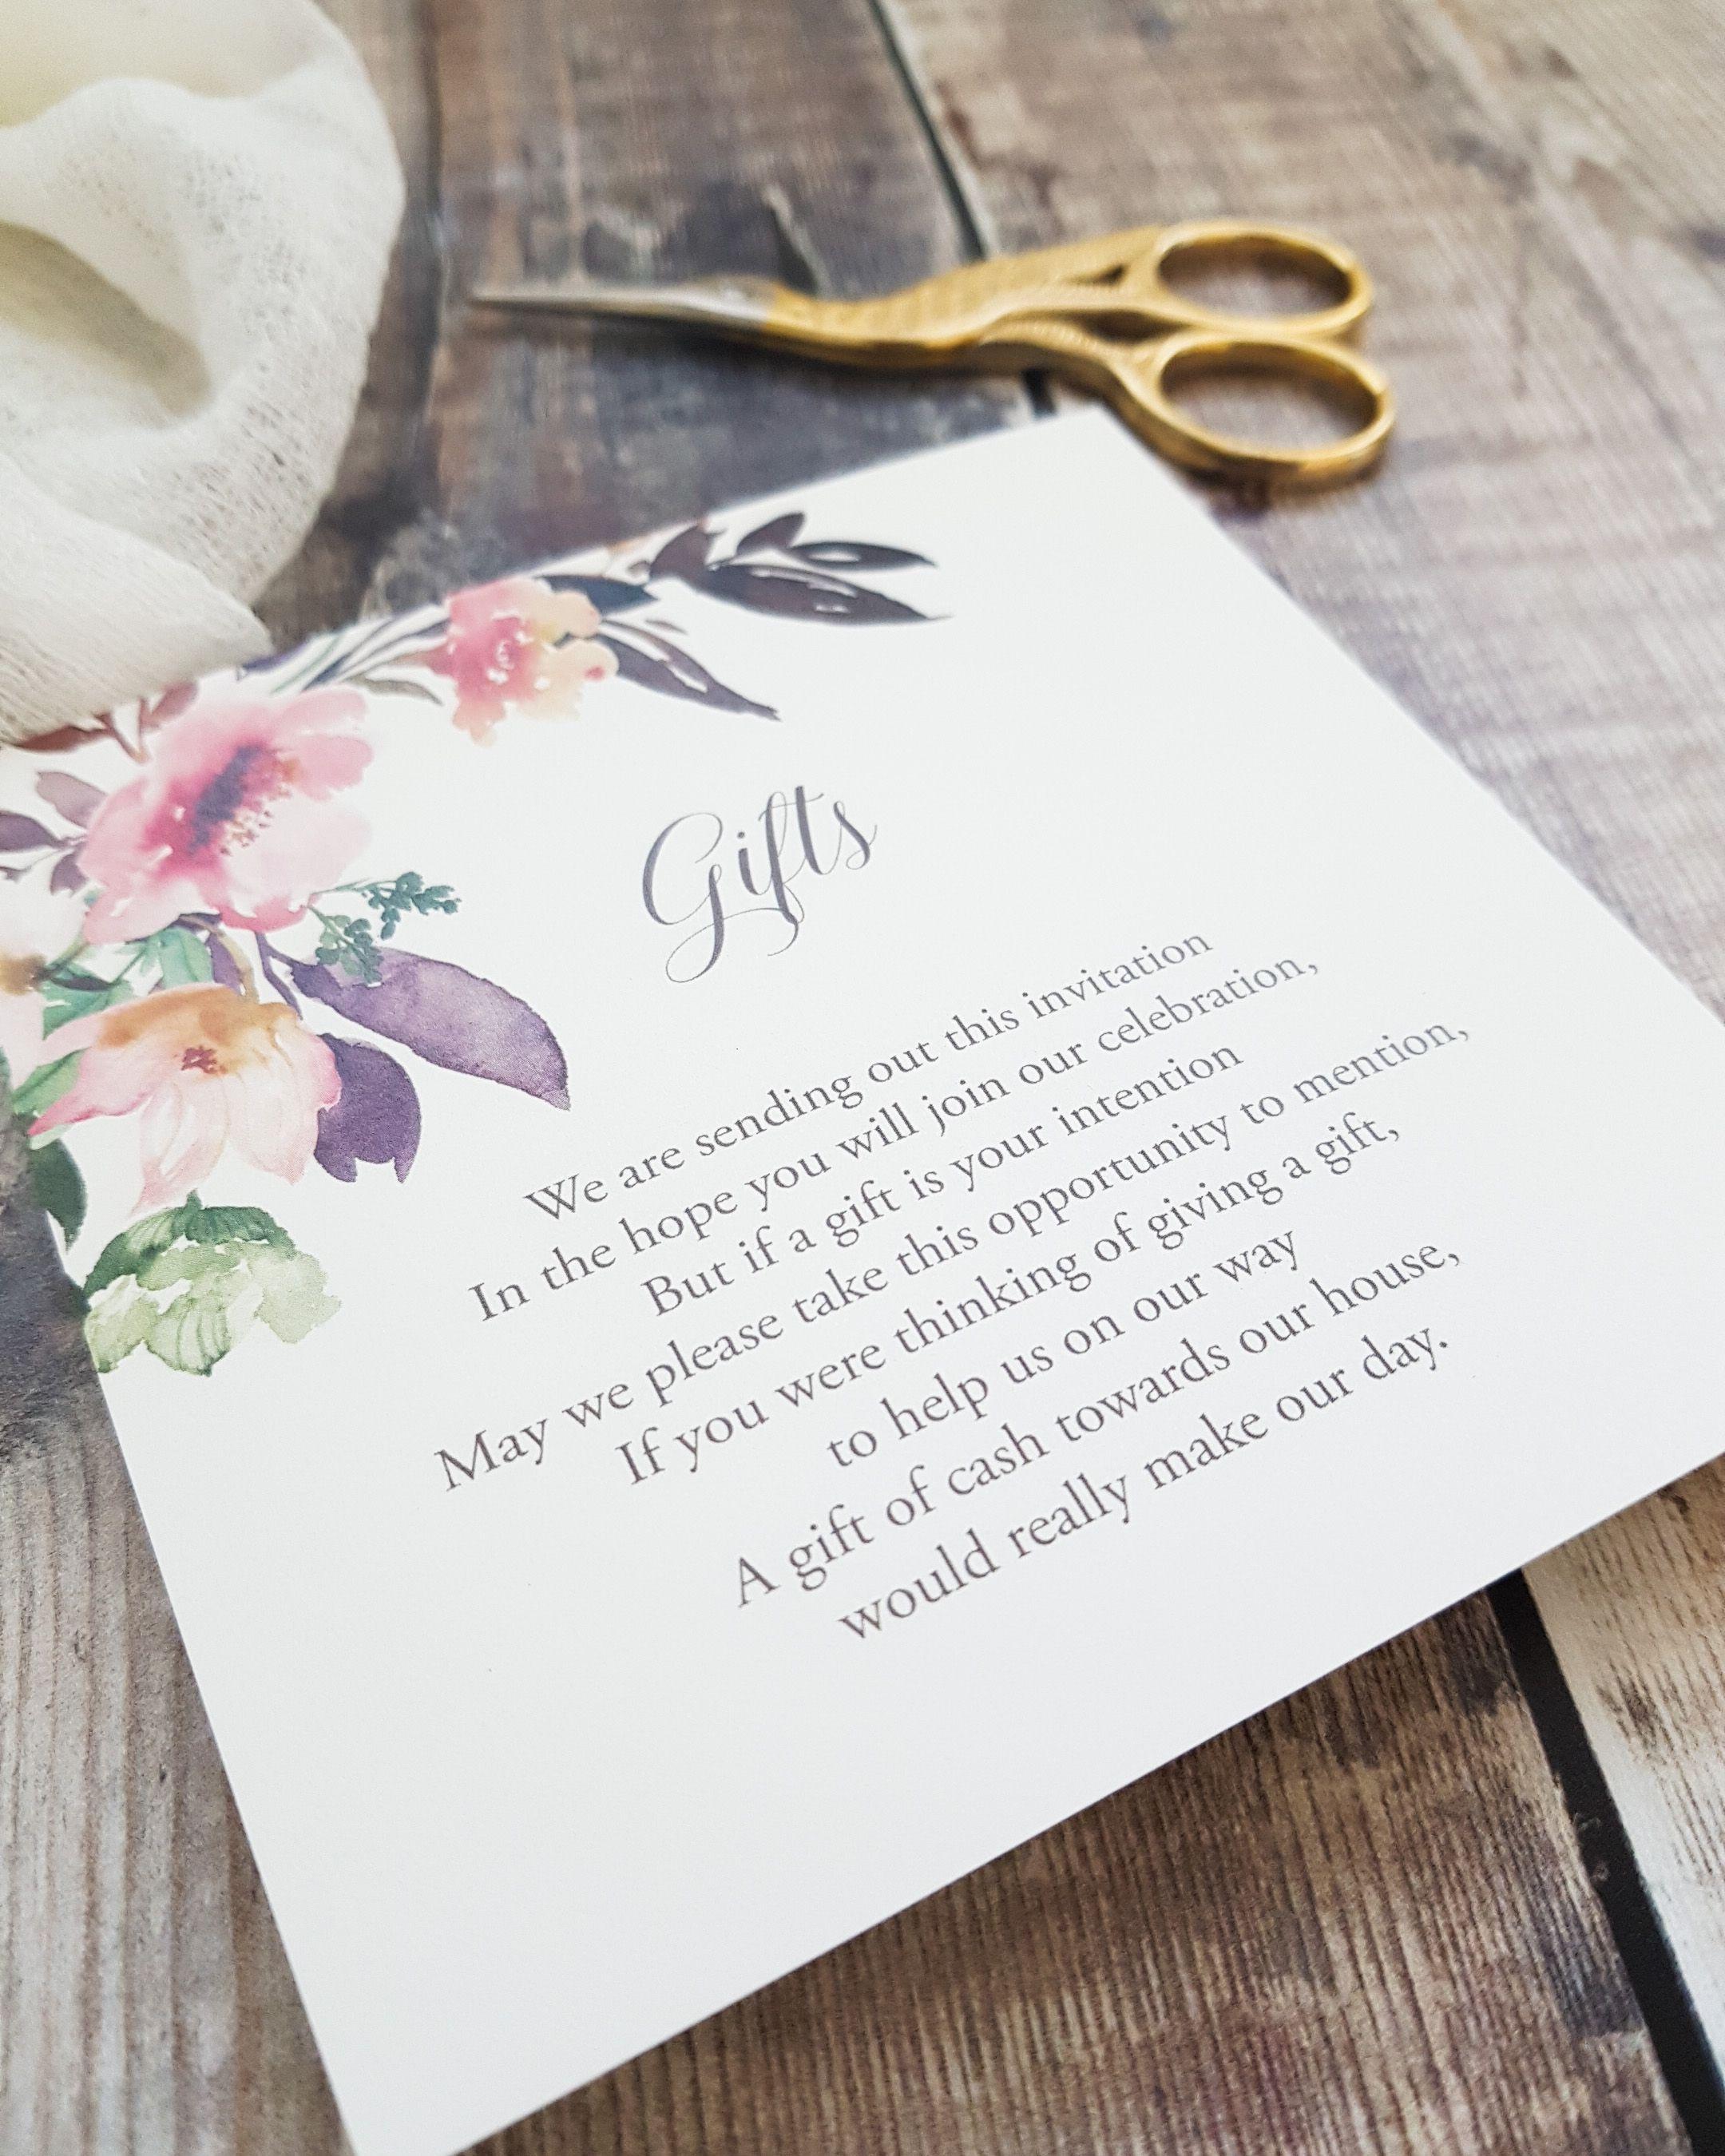 Choosing your wedding gifts wording in 2020 Wedding